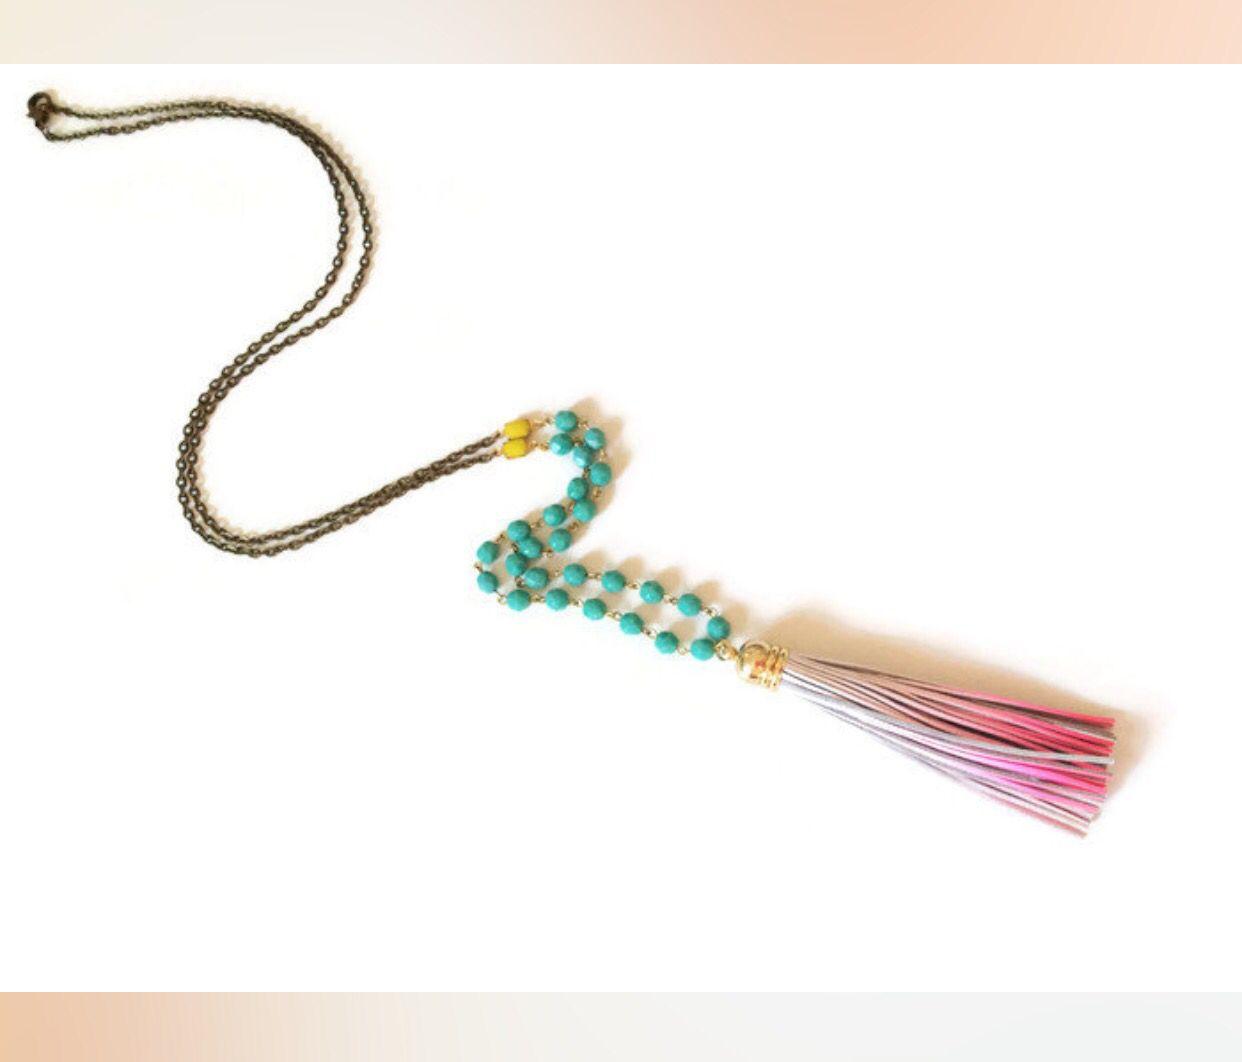 Ombré leather tassel necklace